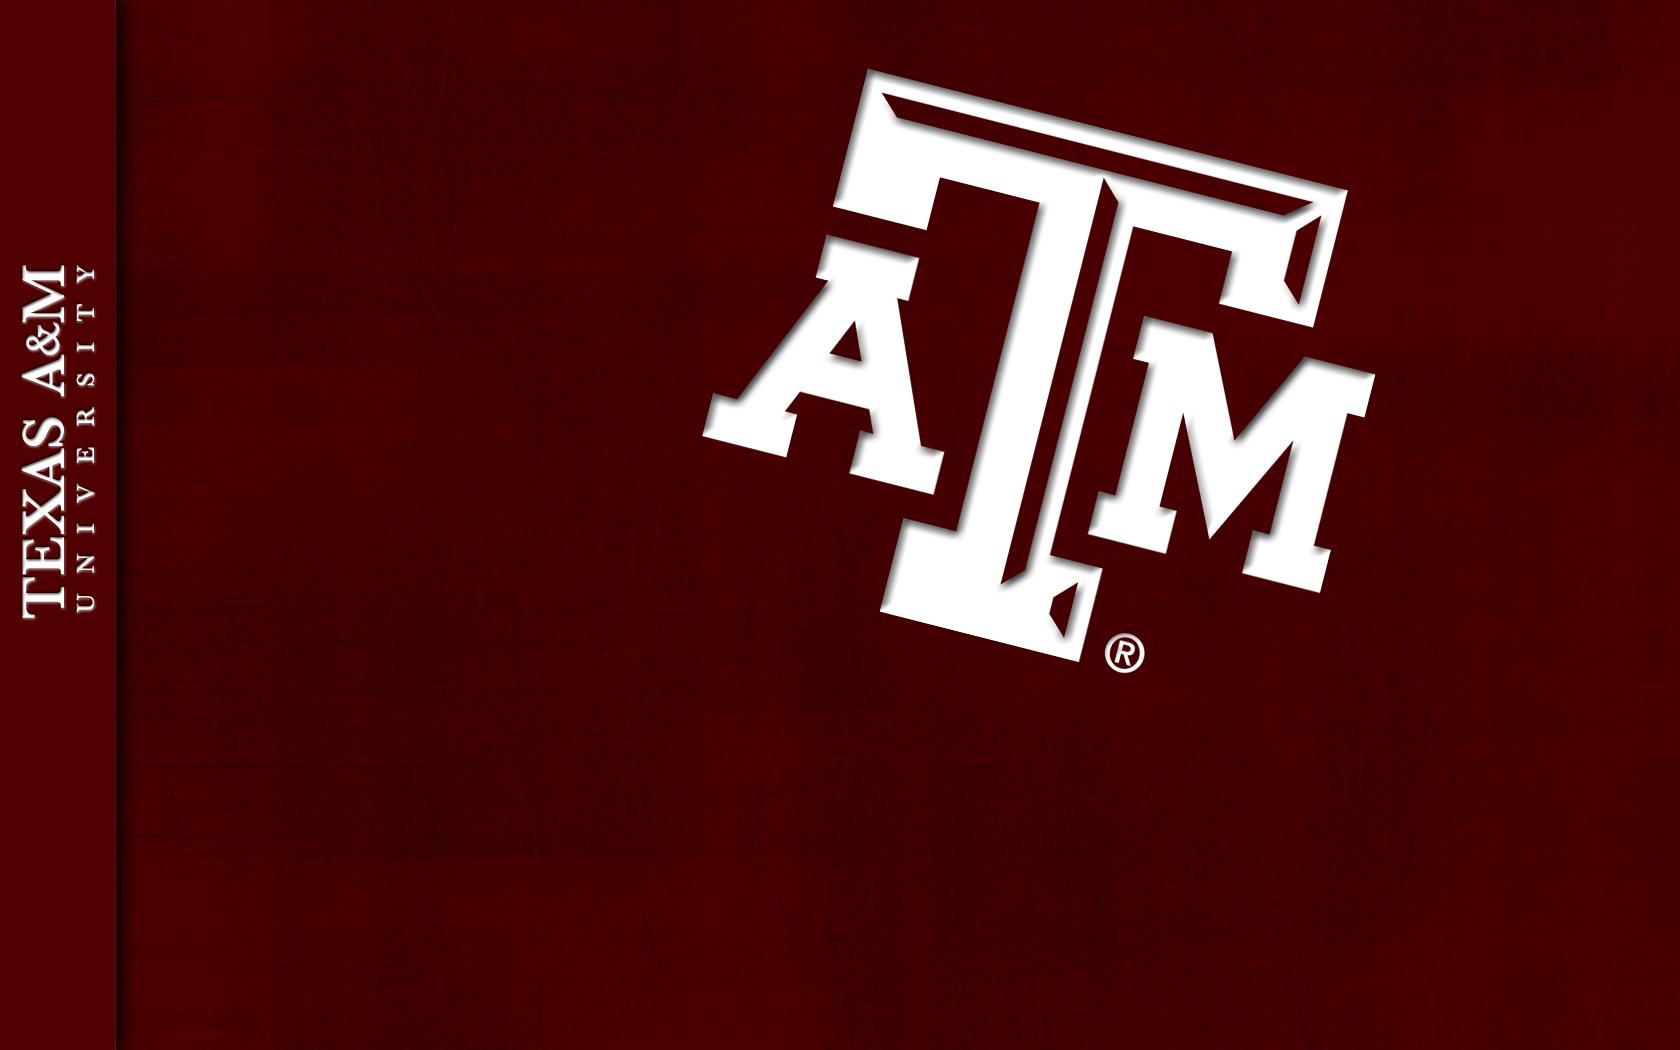 University Brand Guide Texas AM University College Station TX 1680x1050